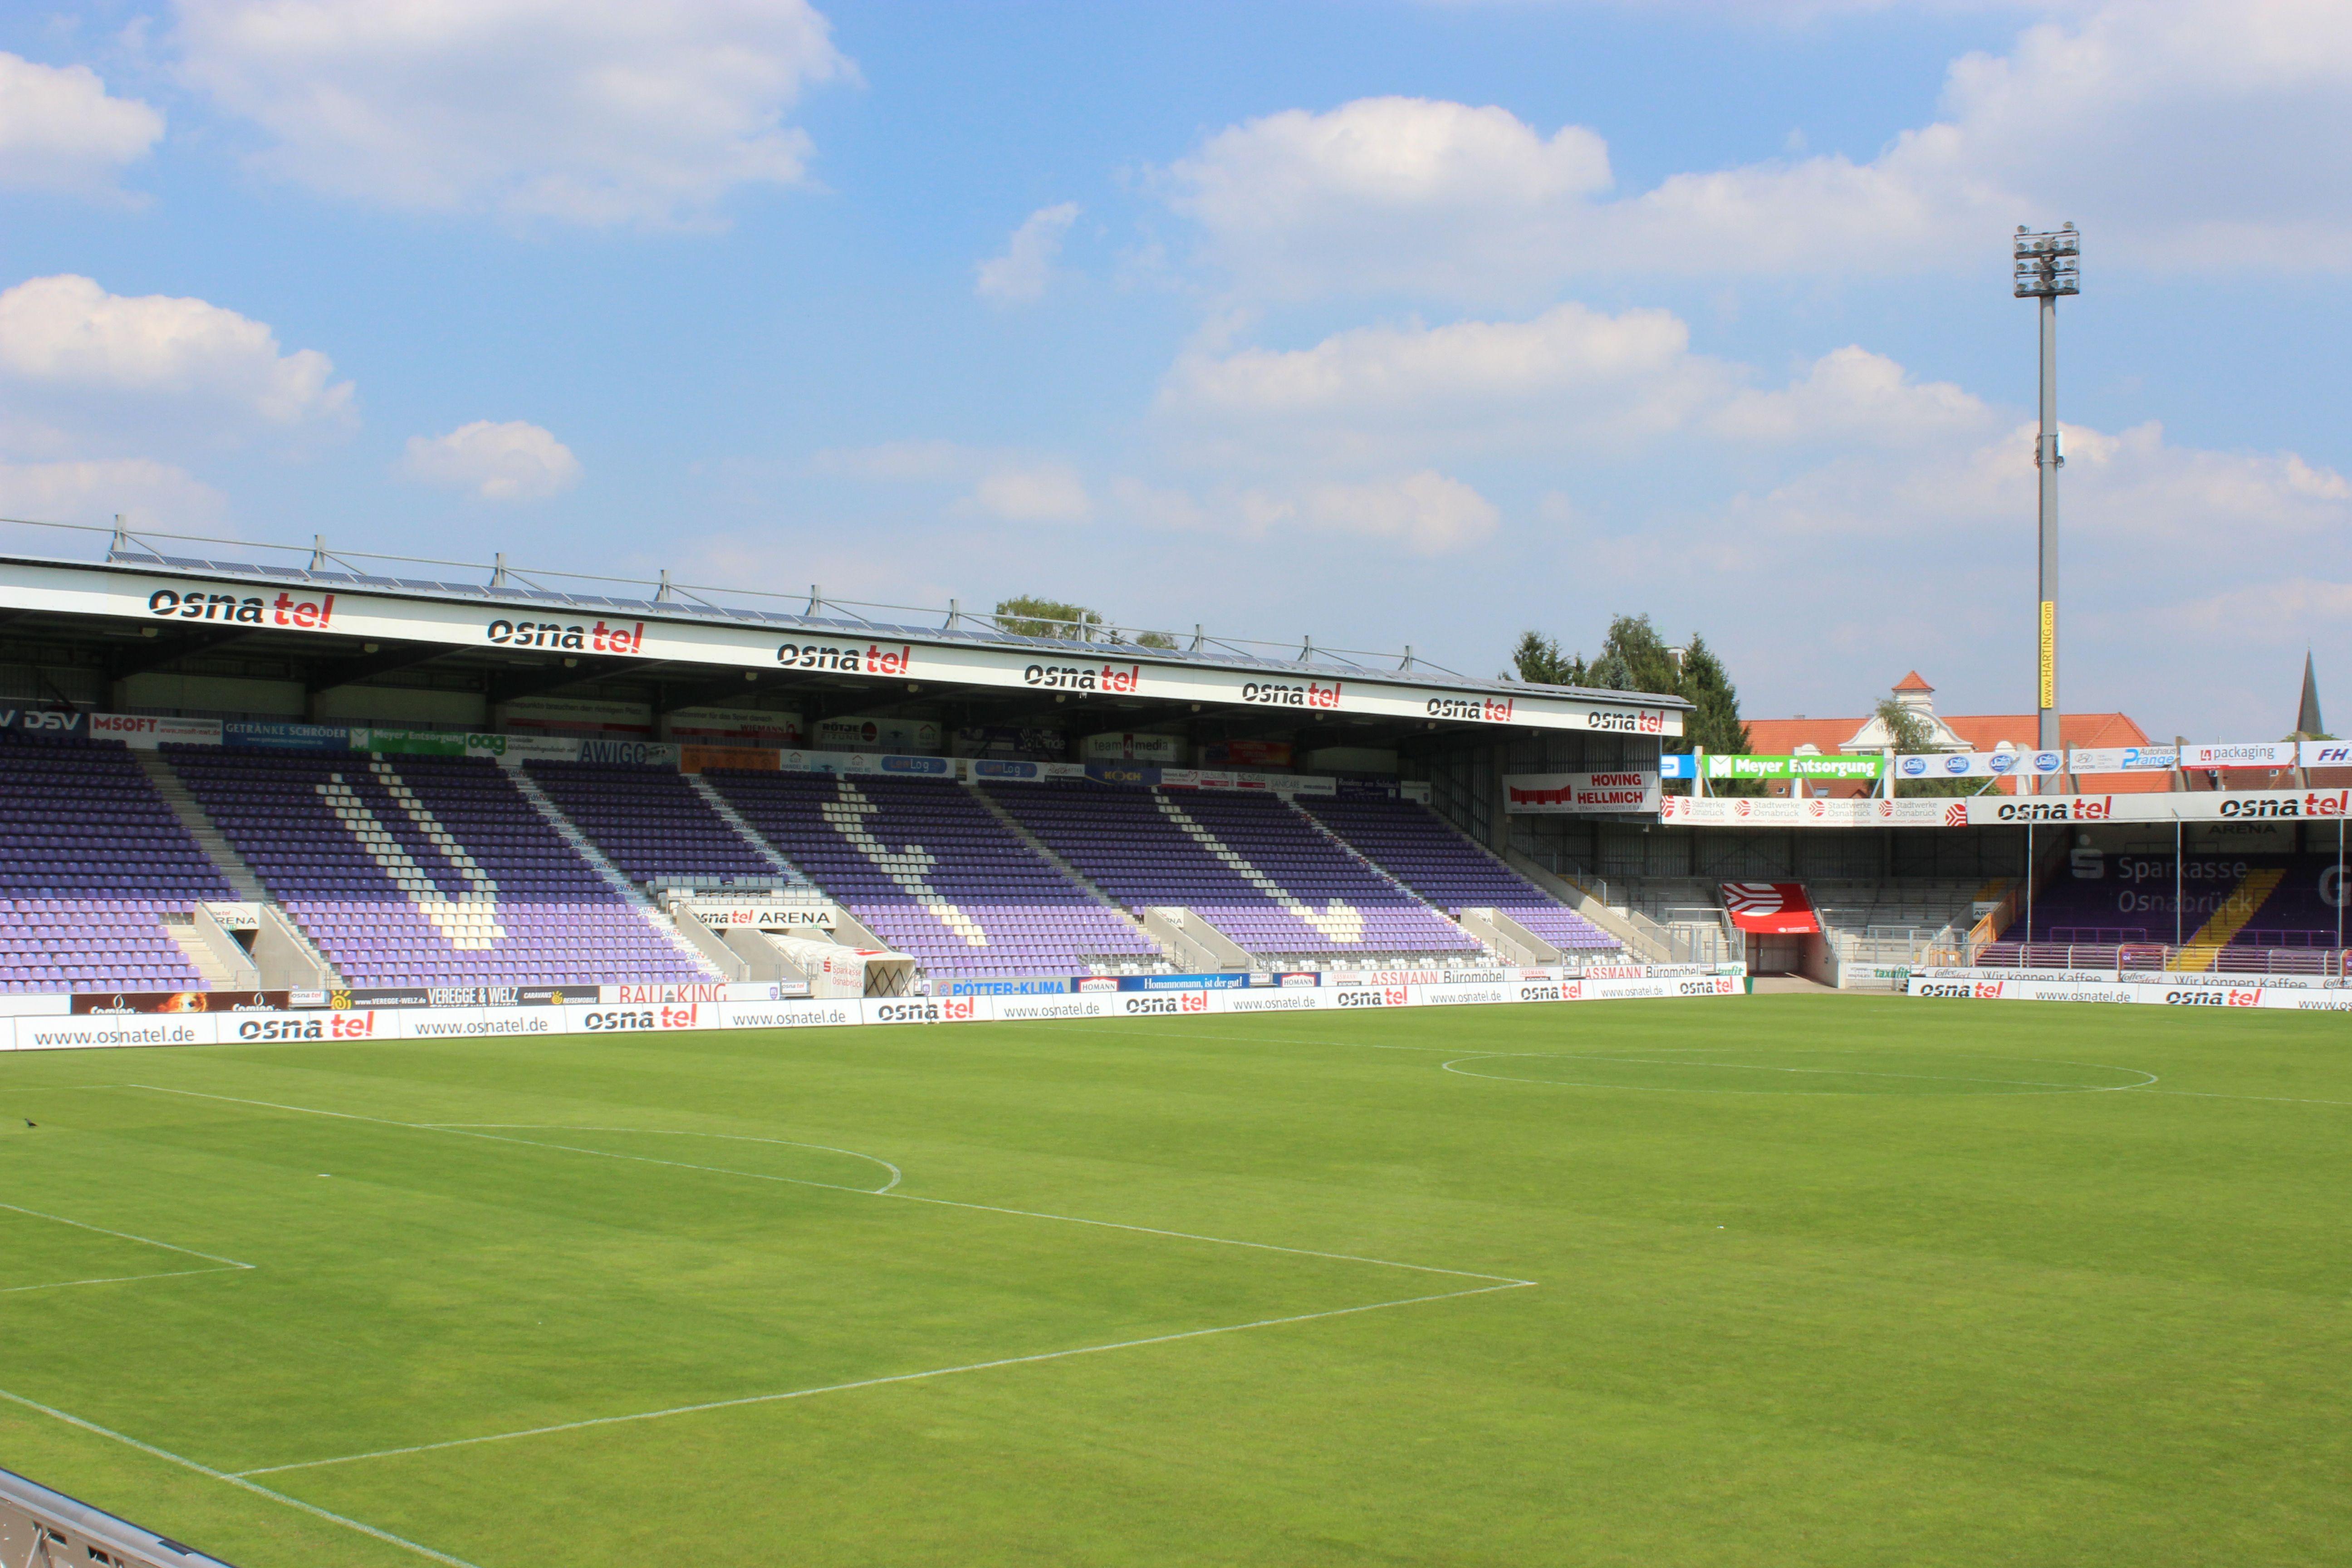 File Vfl Osnabrueck Osnatel Arena 14 Jpg Wikimedia Commons